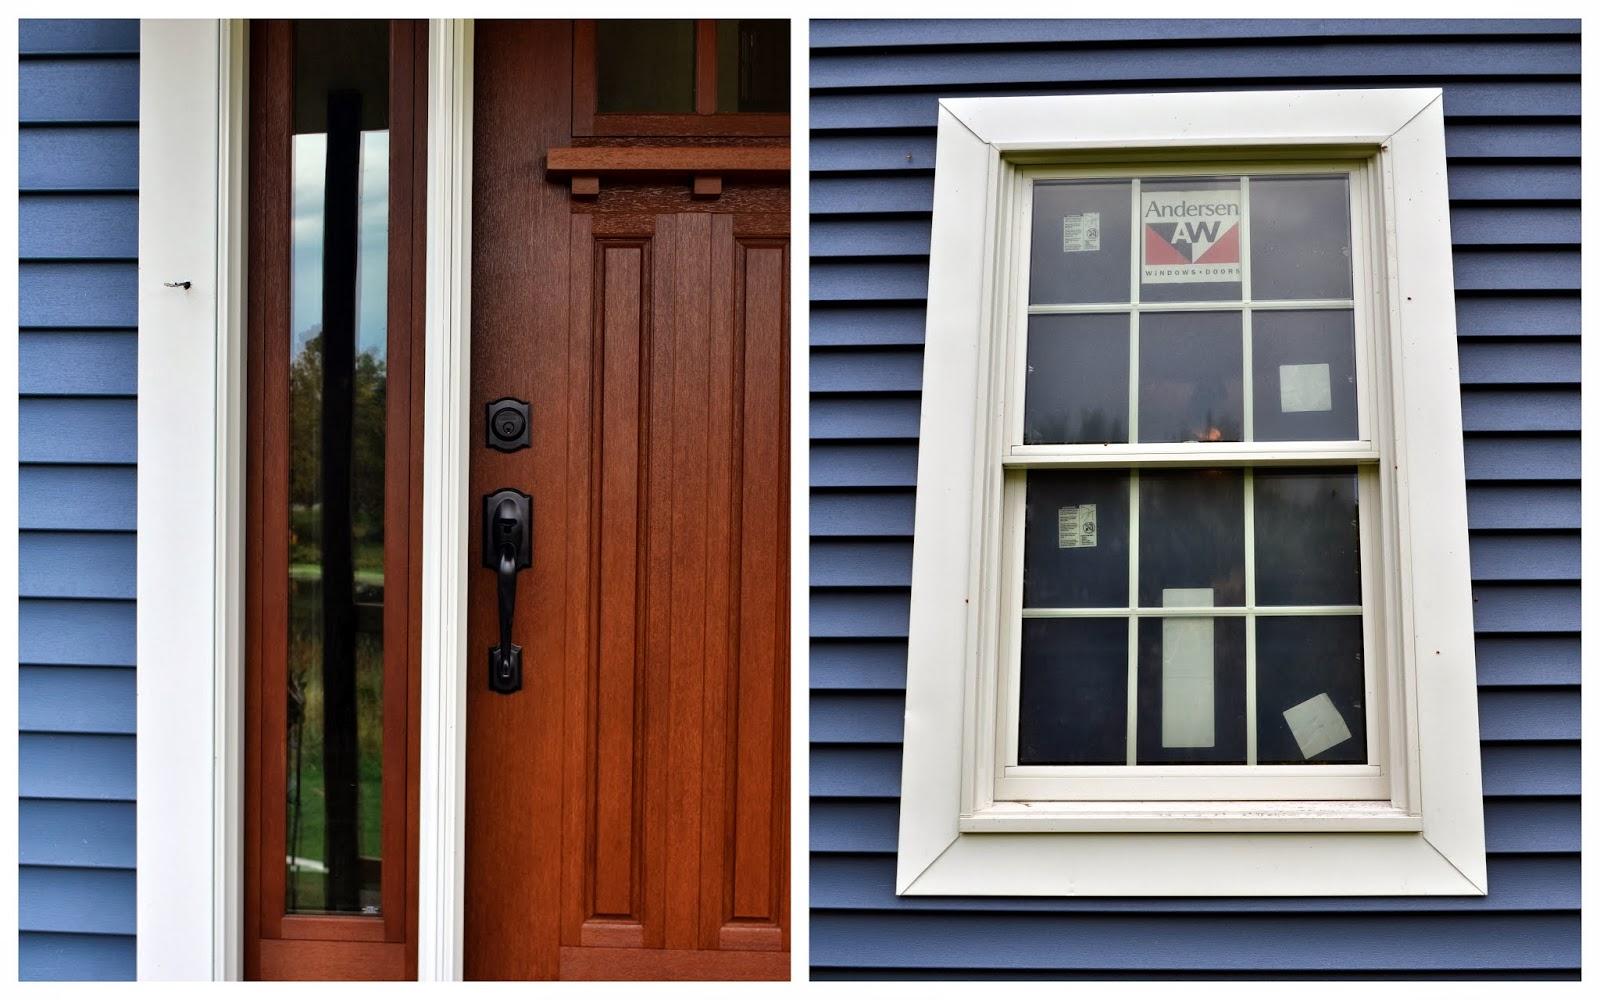 A nurse and a nerd exterior upgrades - Vinyl trim around exterior windows ...